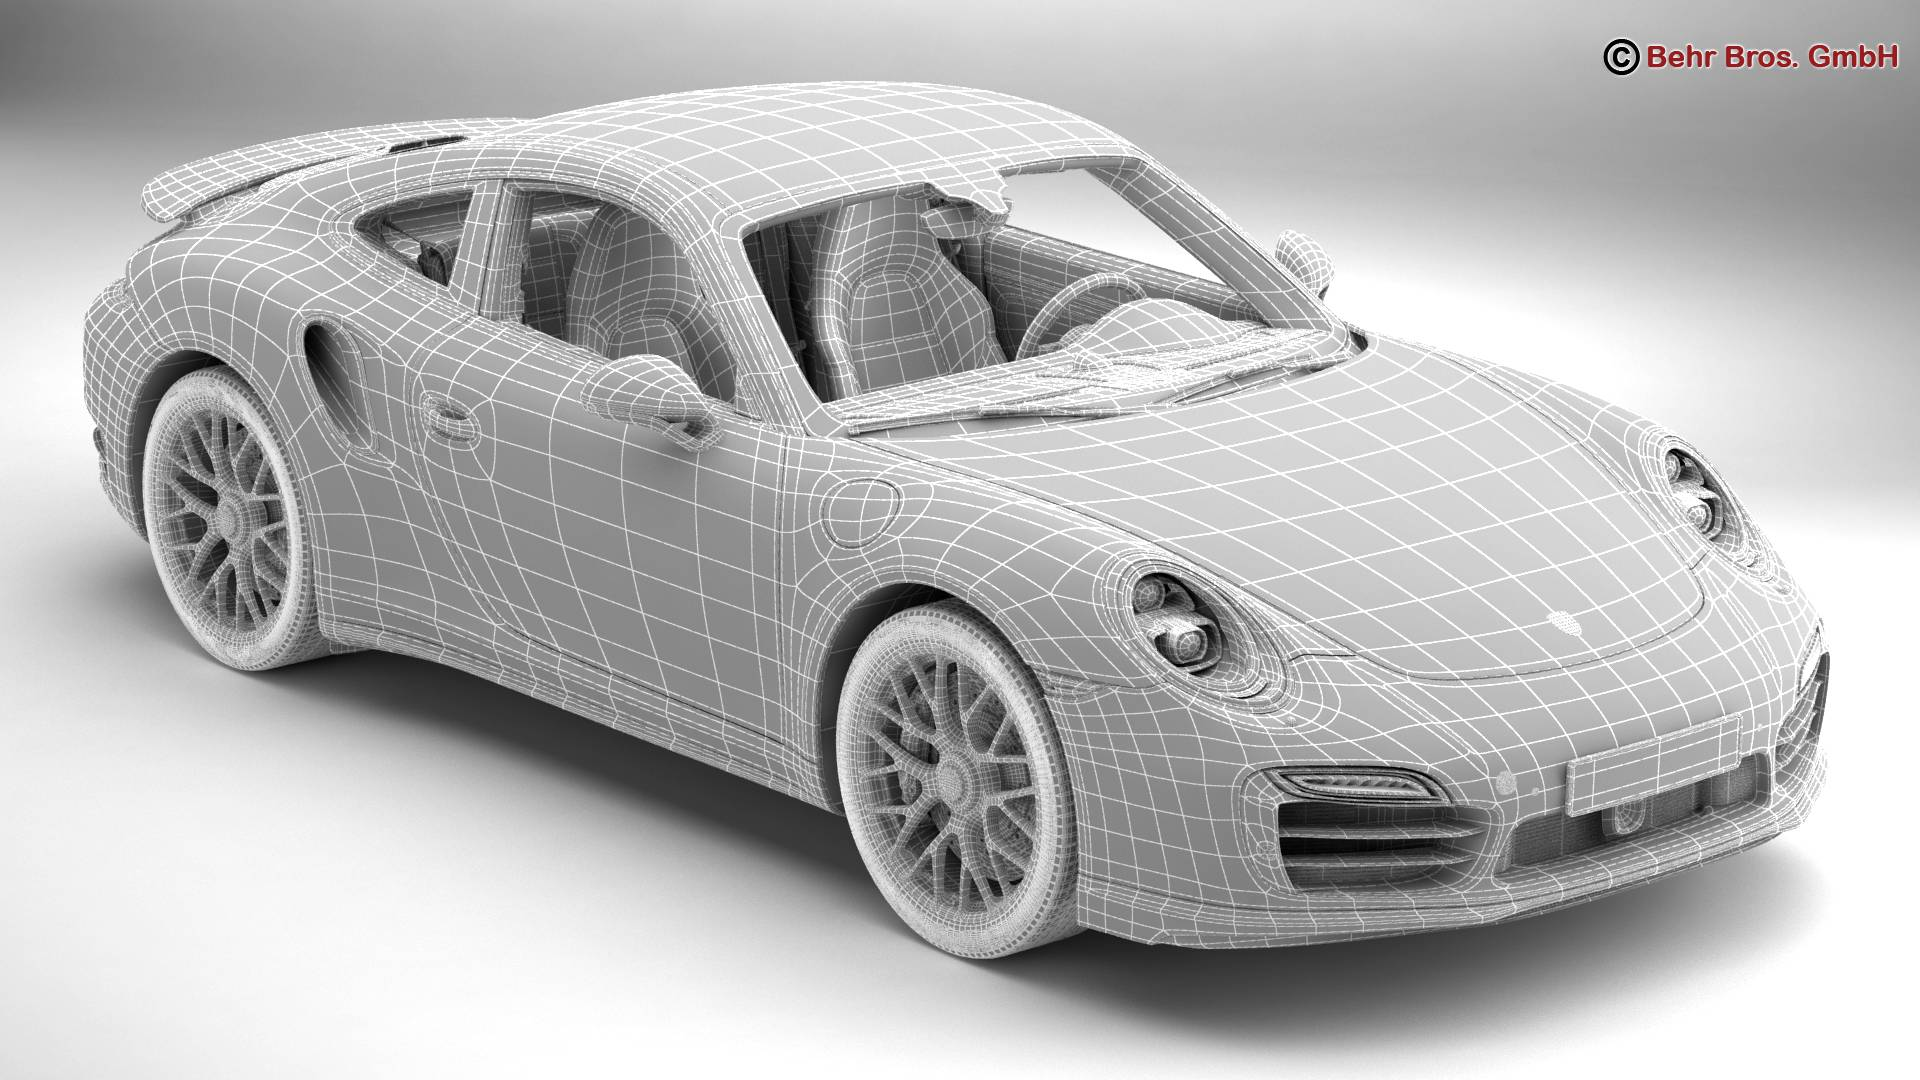 porsche 911 turbo s 2014 3d model 3ds max fbx c4d lwo ma mb obj 212490